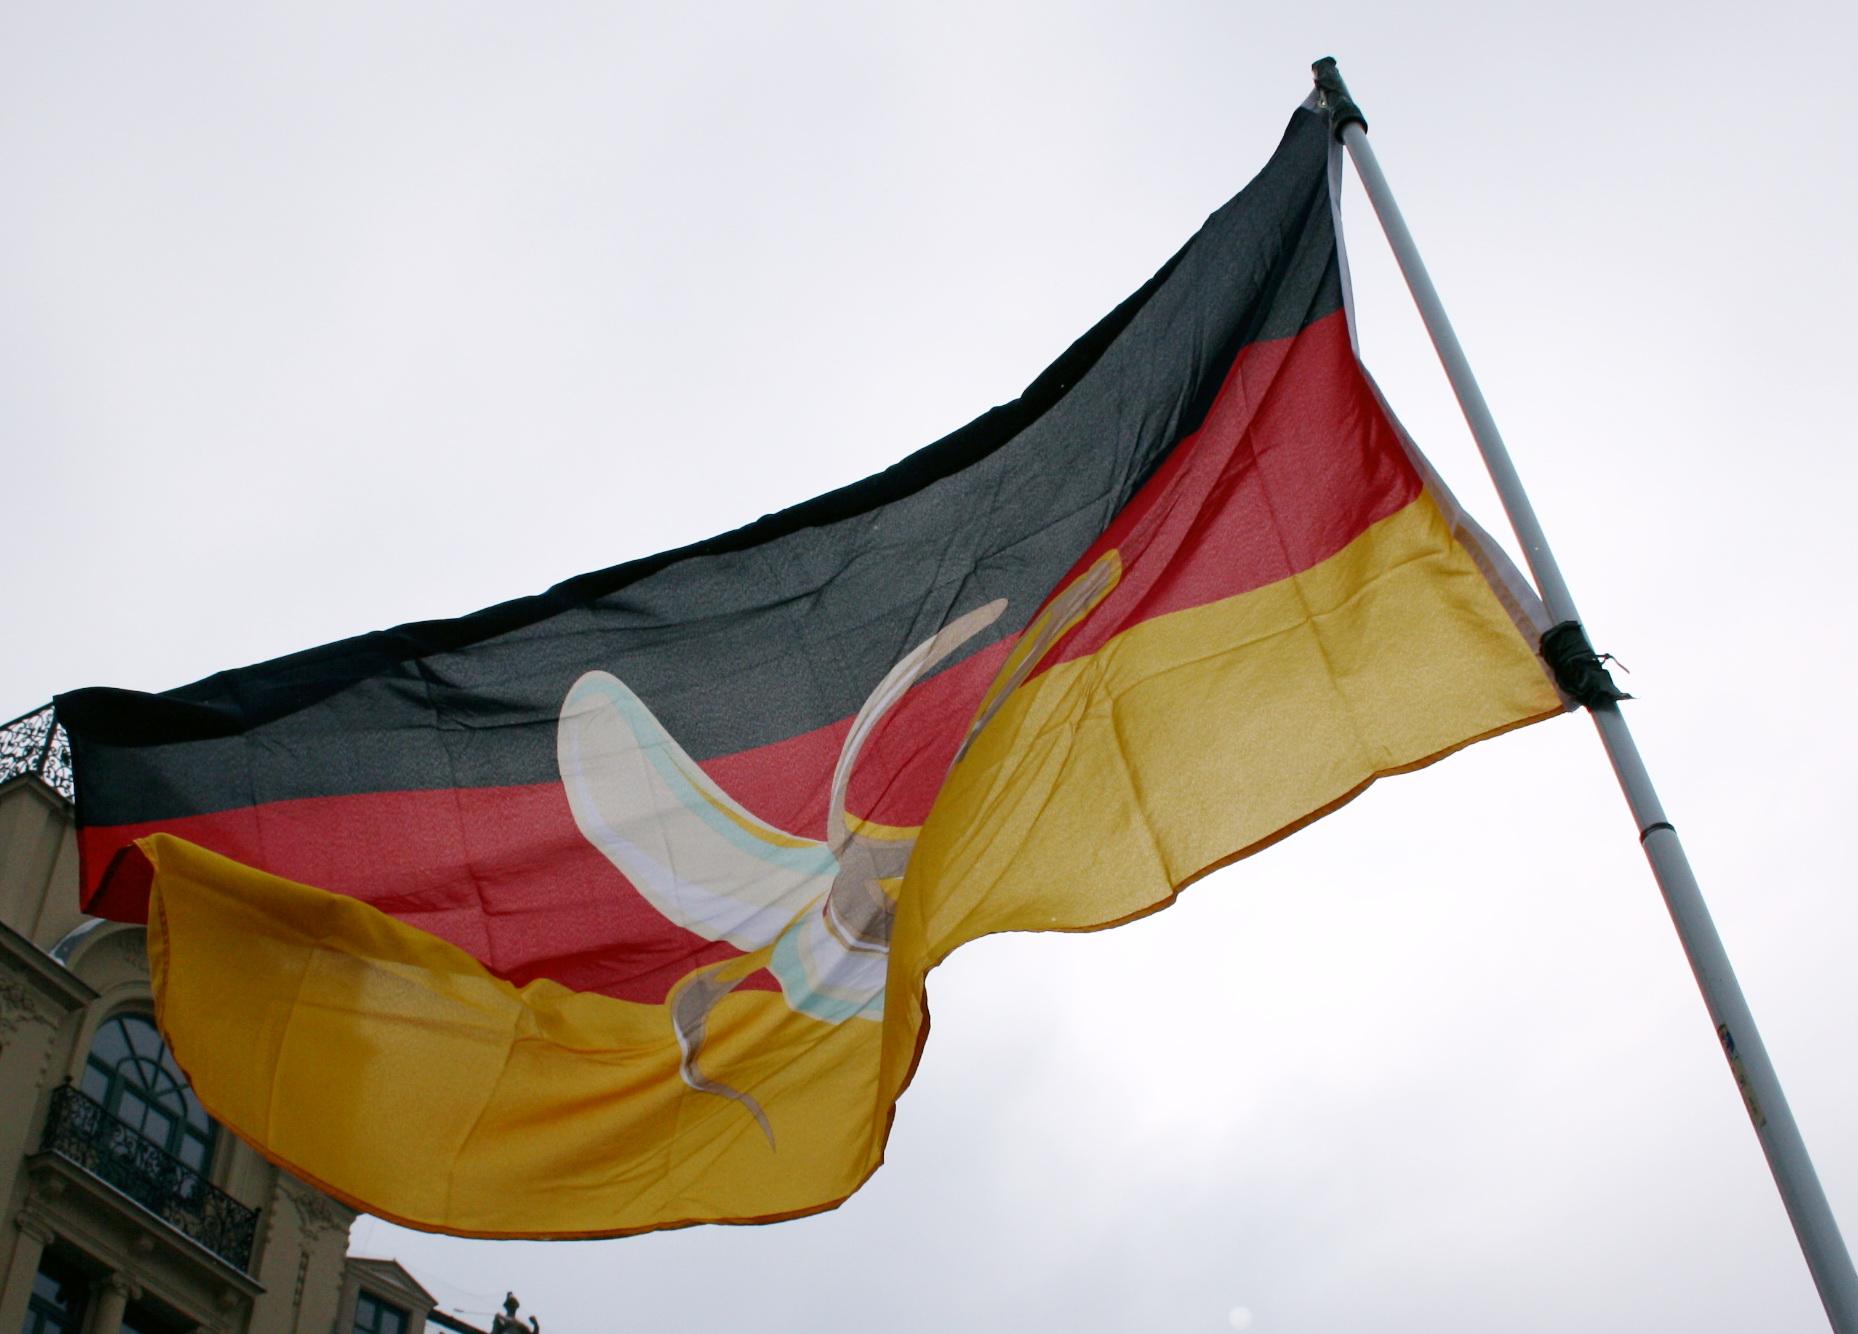 Datei:003 Protest gegen Acta in Munich.JPG – Wikipedia